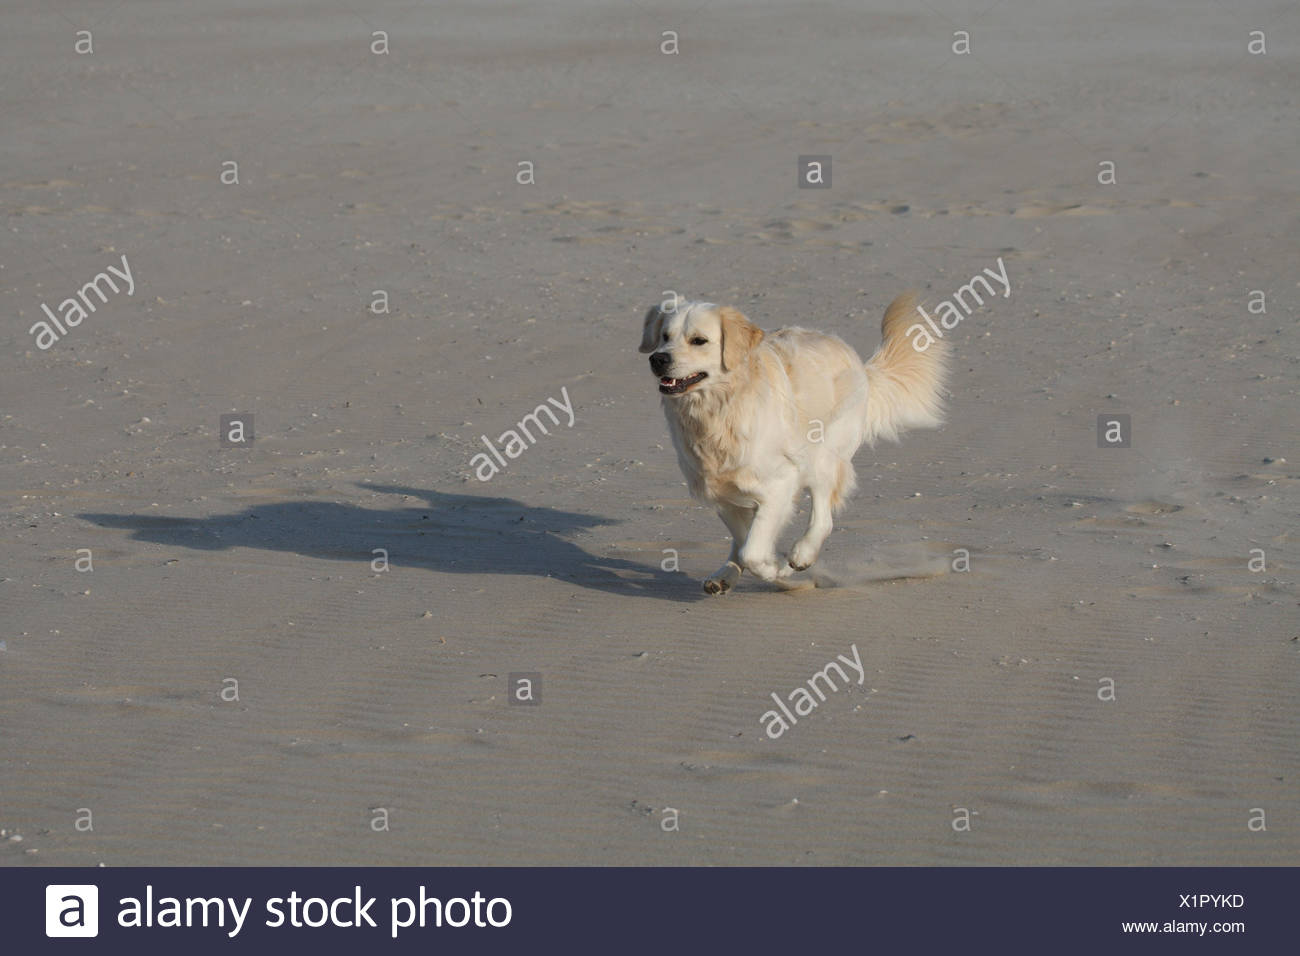 Golden retrievers, beach, run, - Stock Image